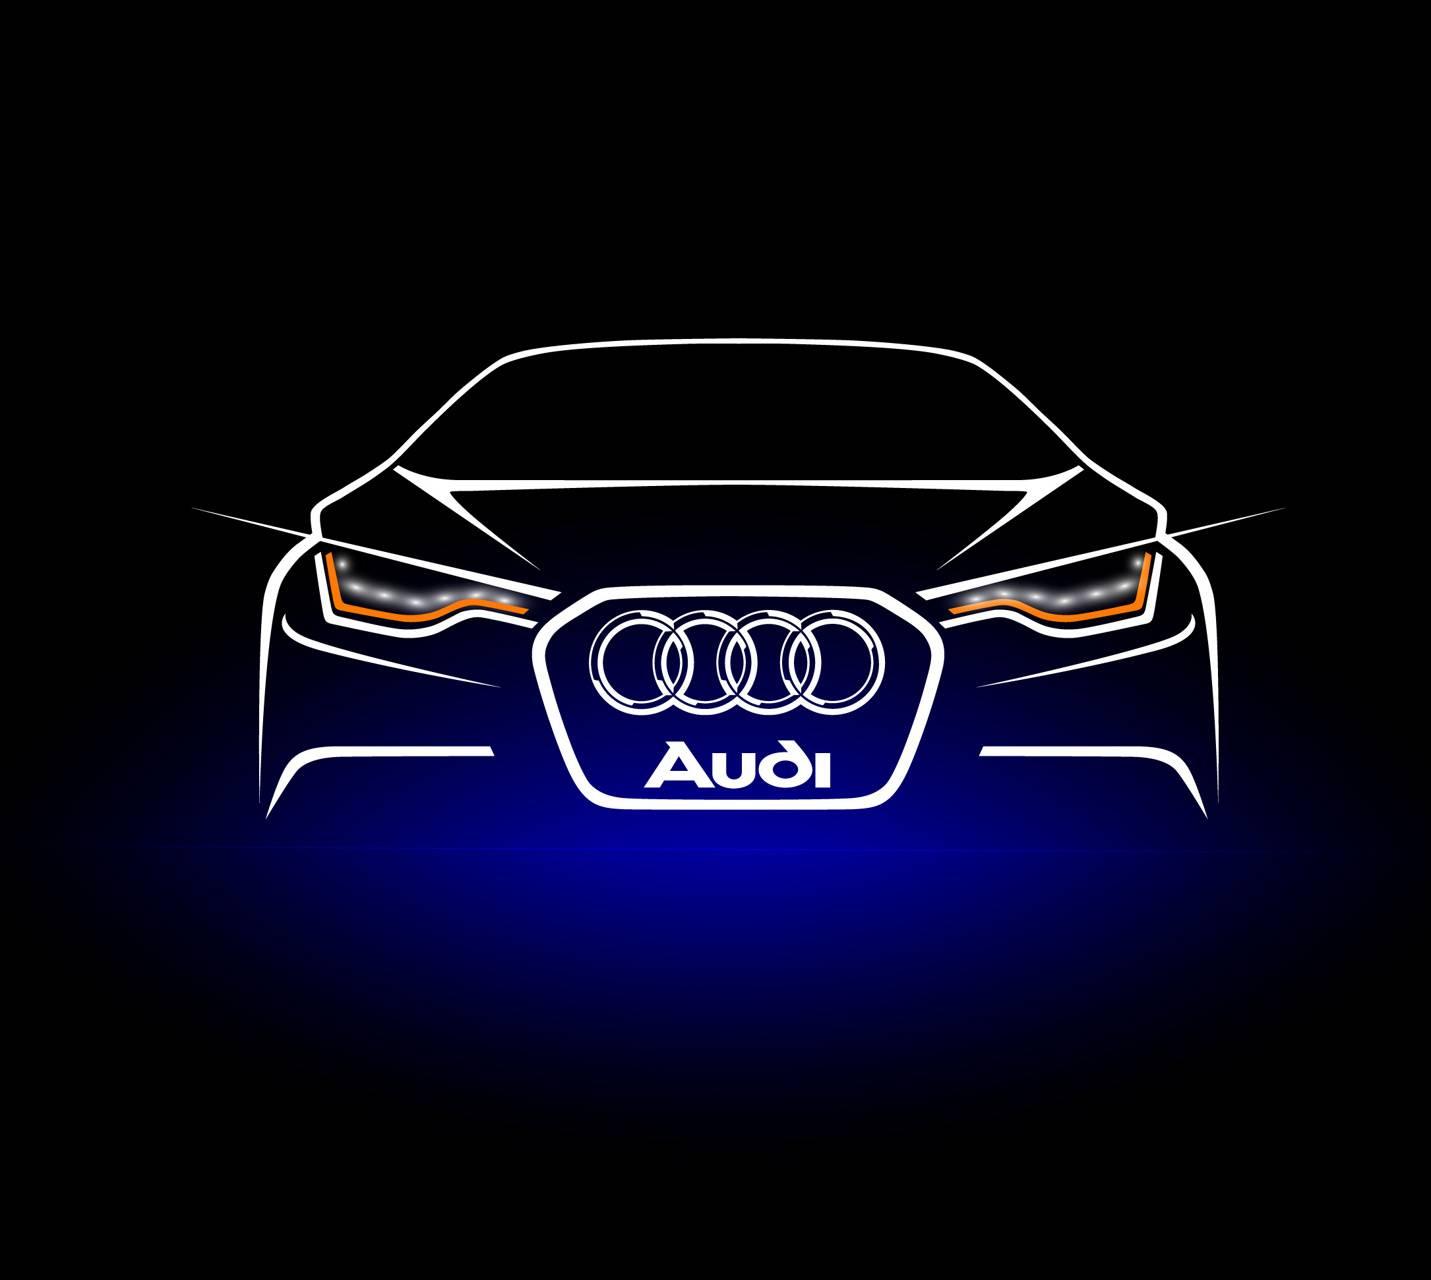 Audi Sketch Design